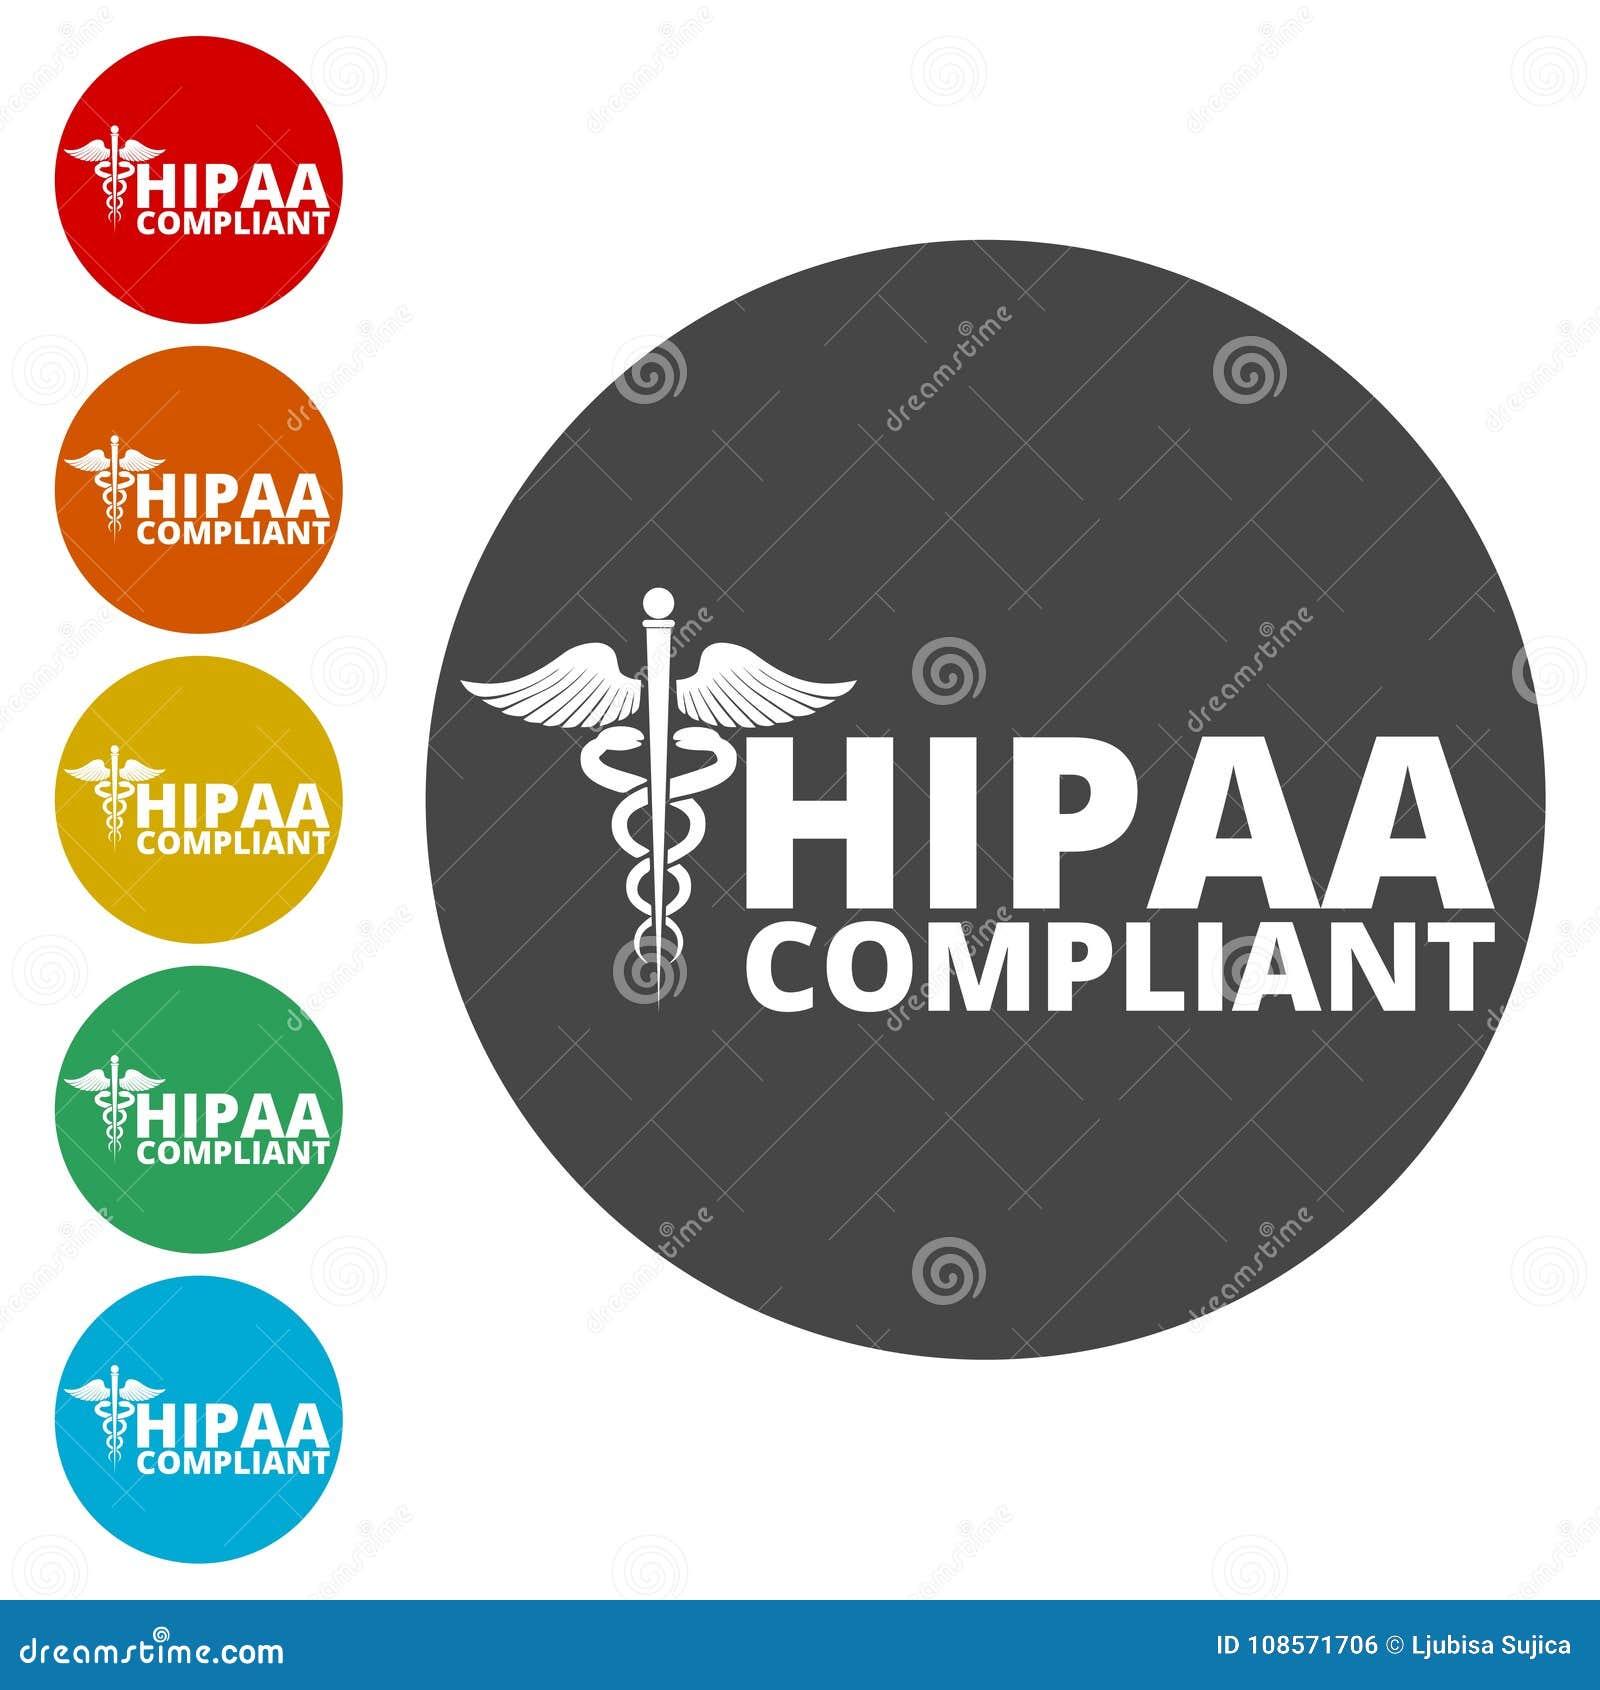 HIPAA - Health Insurance Portability And Accountability Act Icon Stock Vector - Illustration of ...